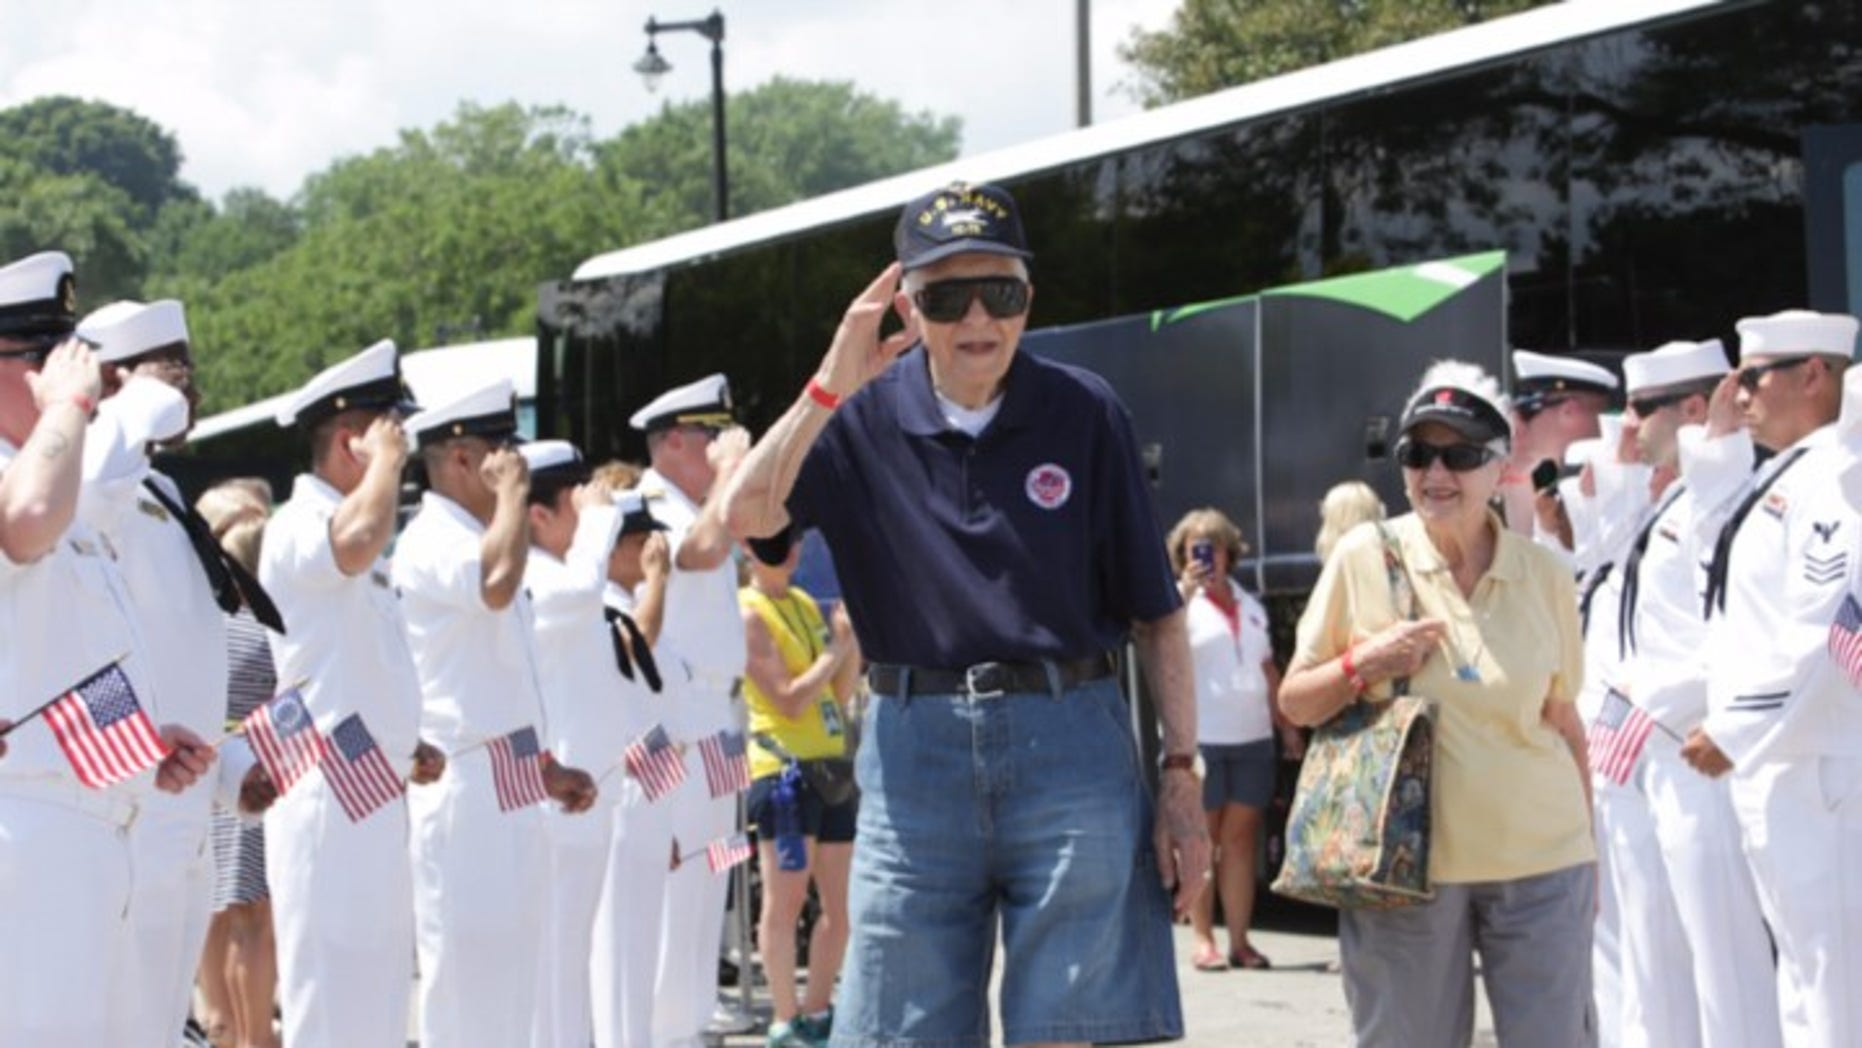 Veteran Chuck Franzke's celebratory dancing videos have gone viral.